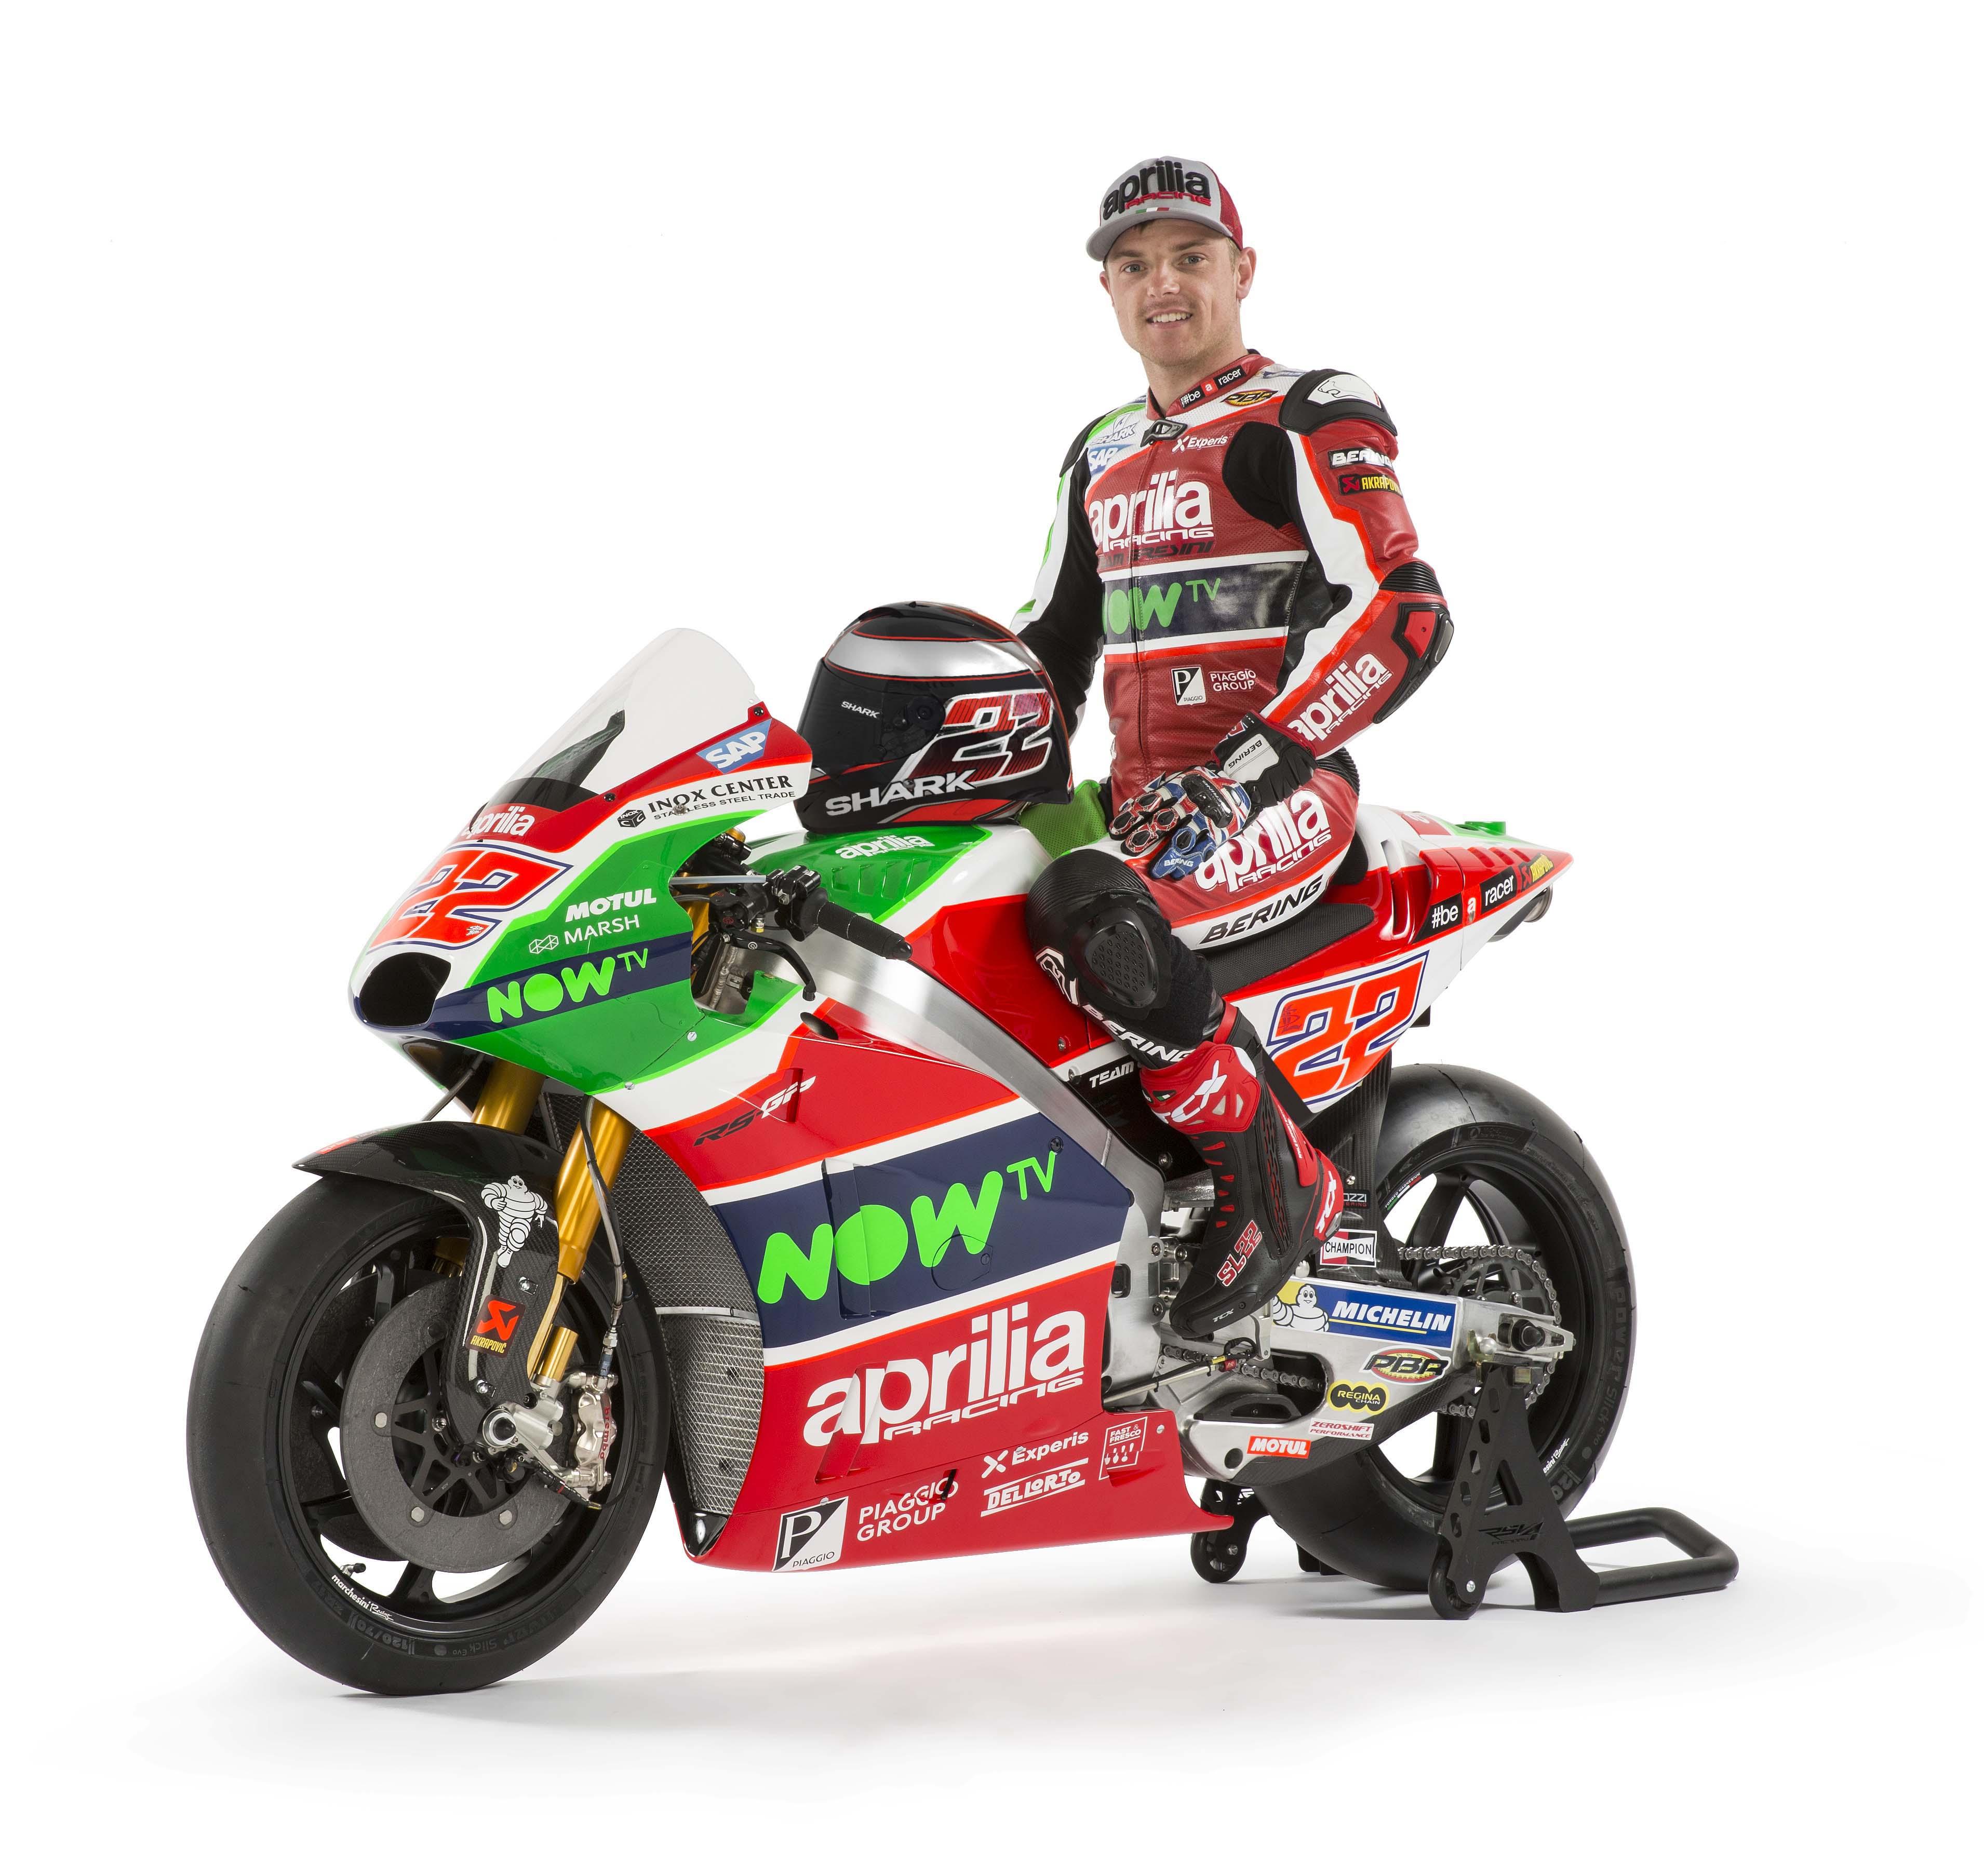 The 2017 Aprilia RS-GP MotoGP Race Bike Debuts - Asphalt